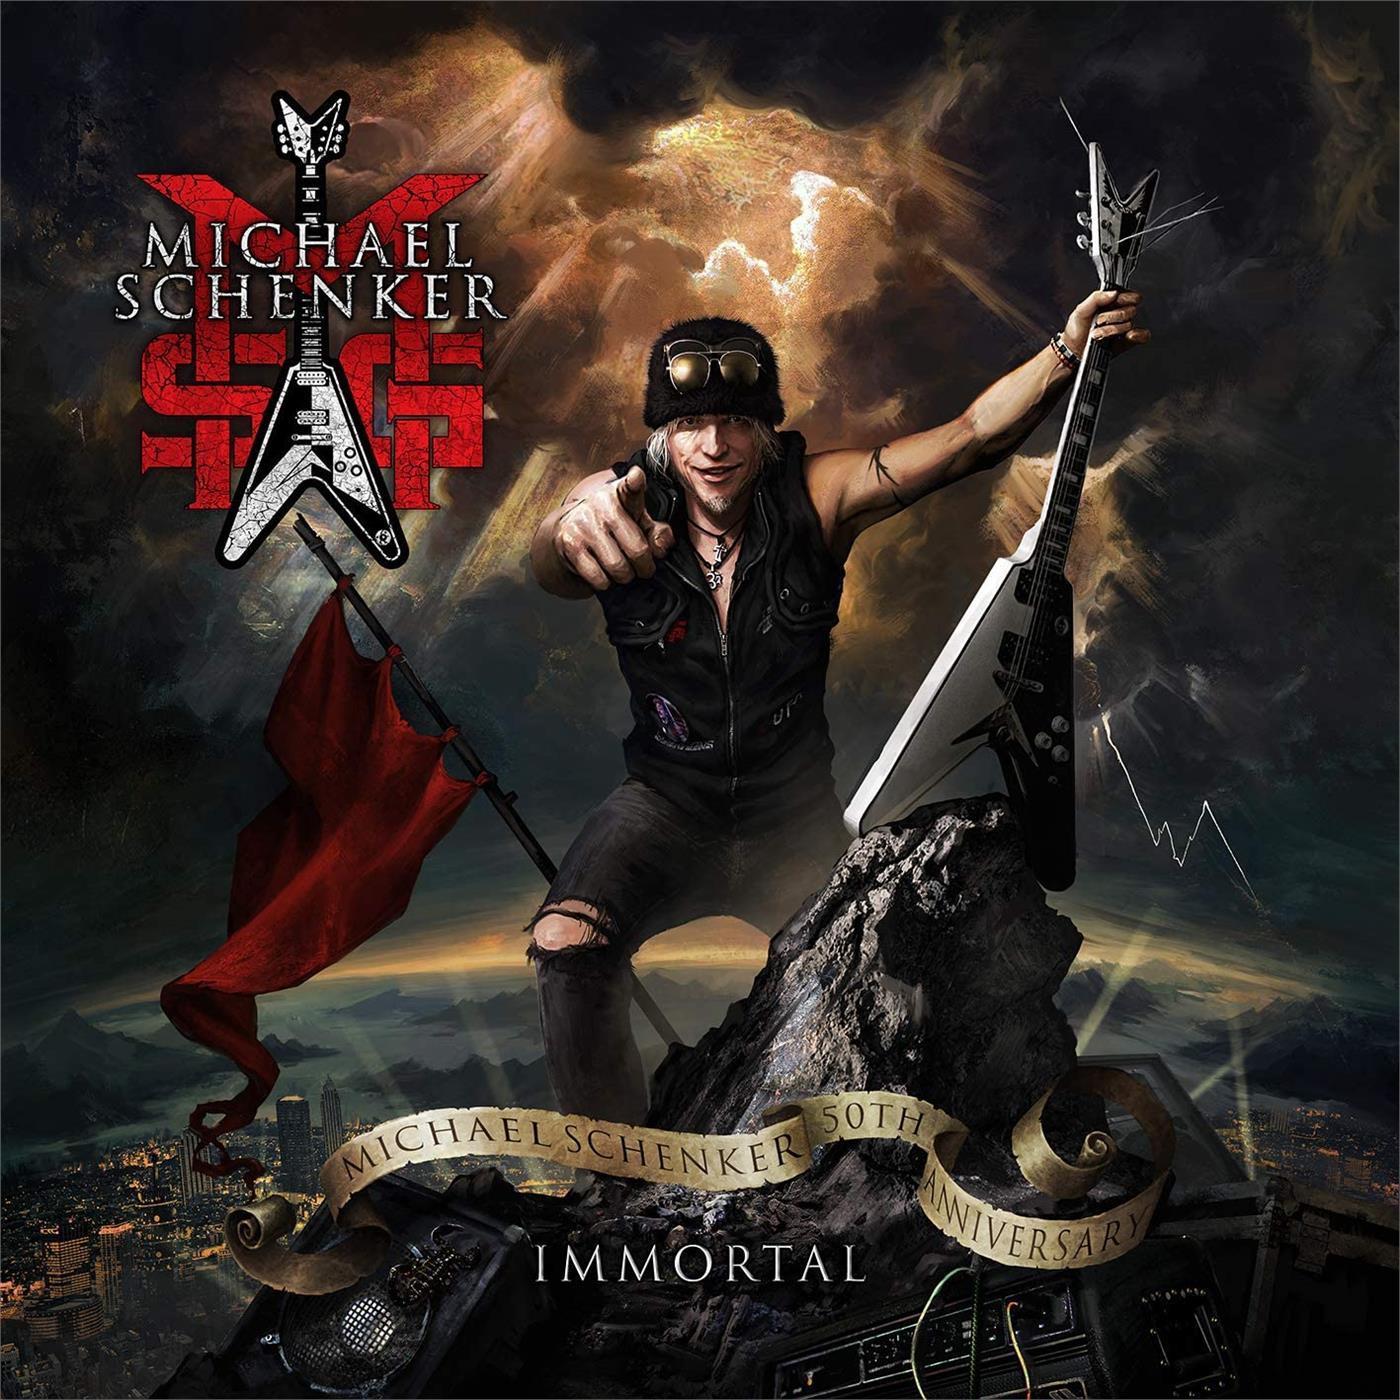 MSG (Michael Schenker Group) - Immortal [LTD LP]